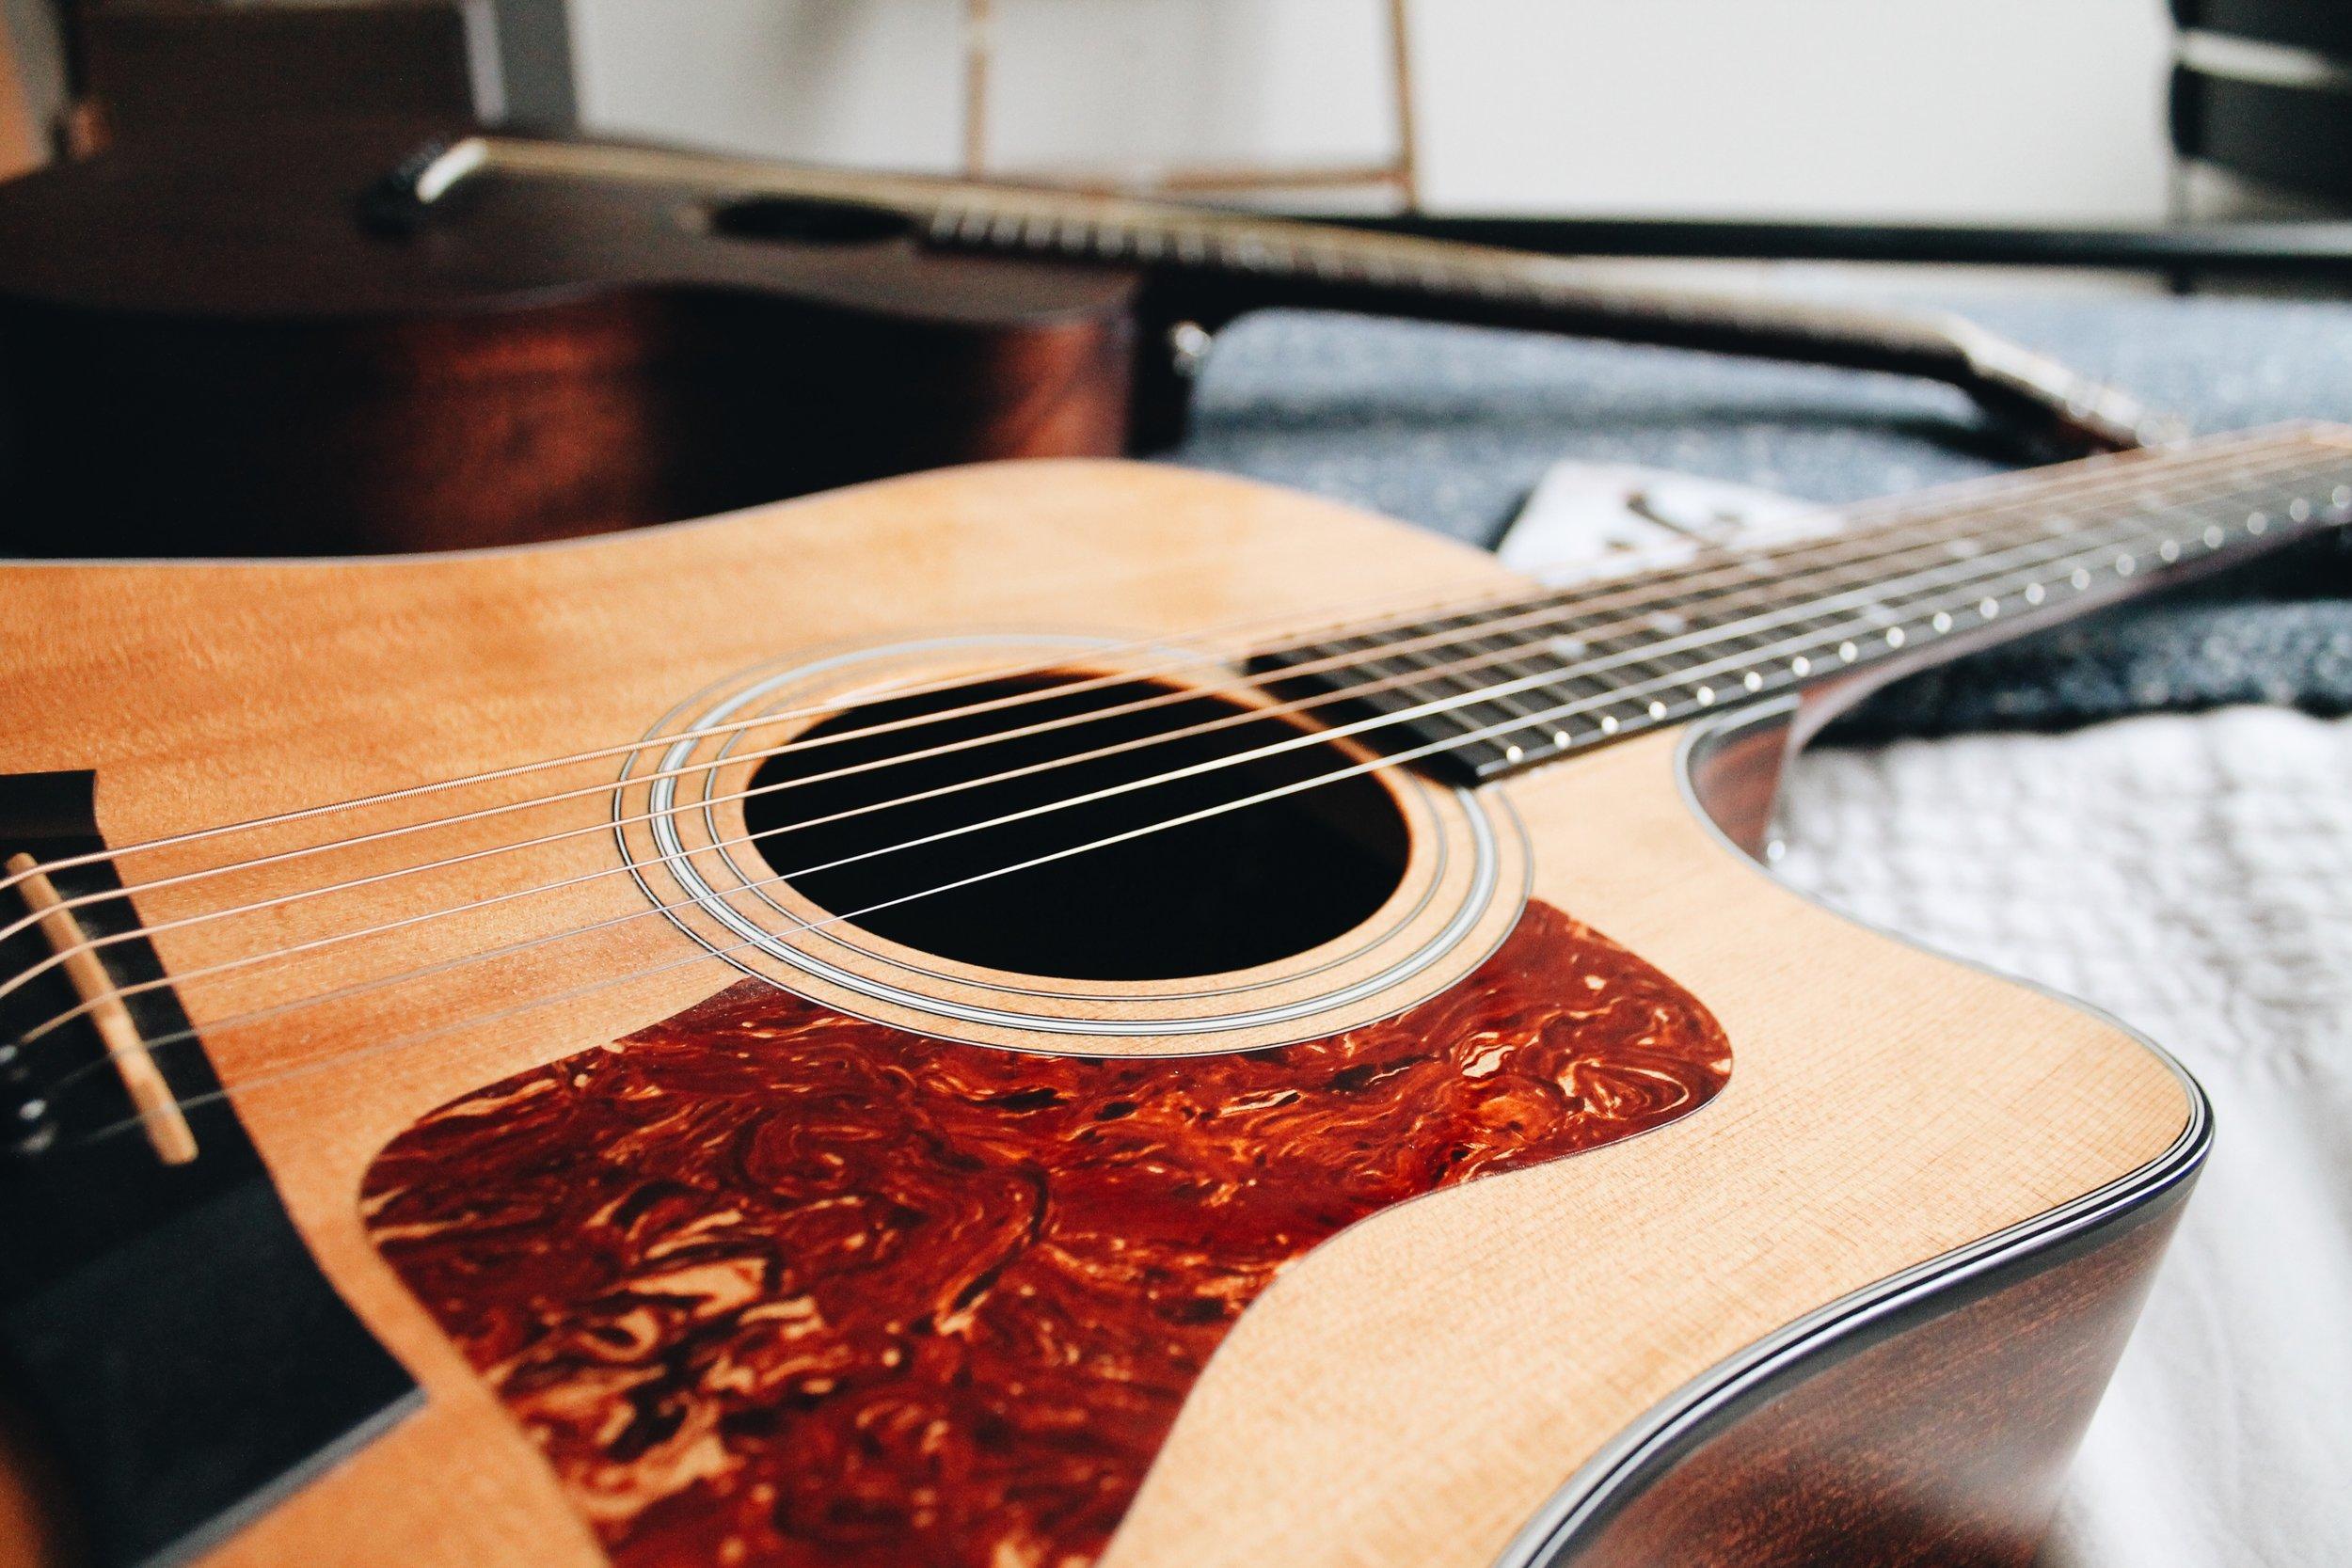 Taylor and orangewood guitars